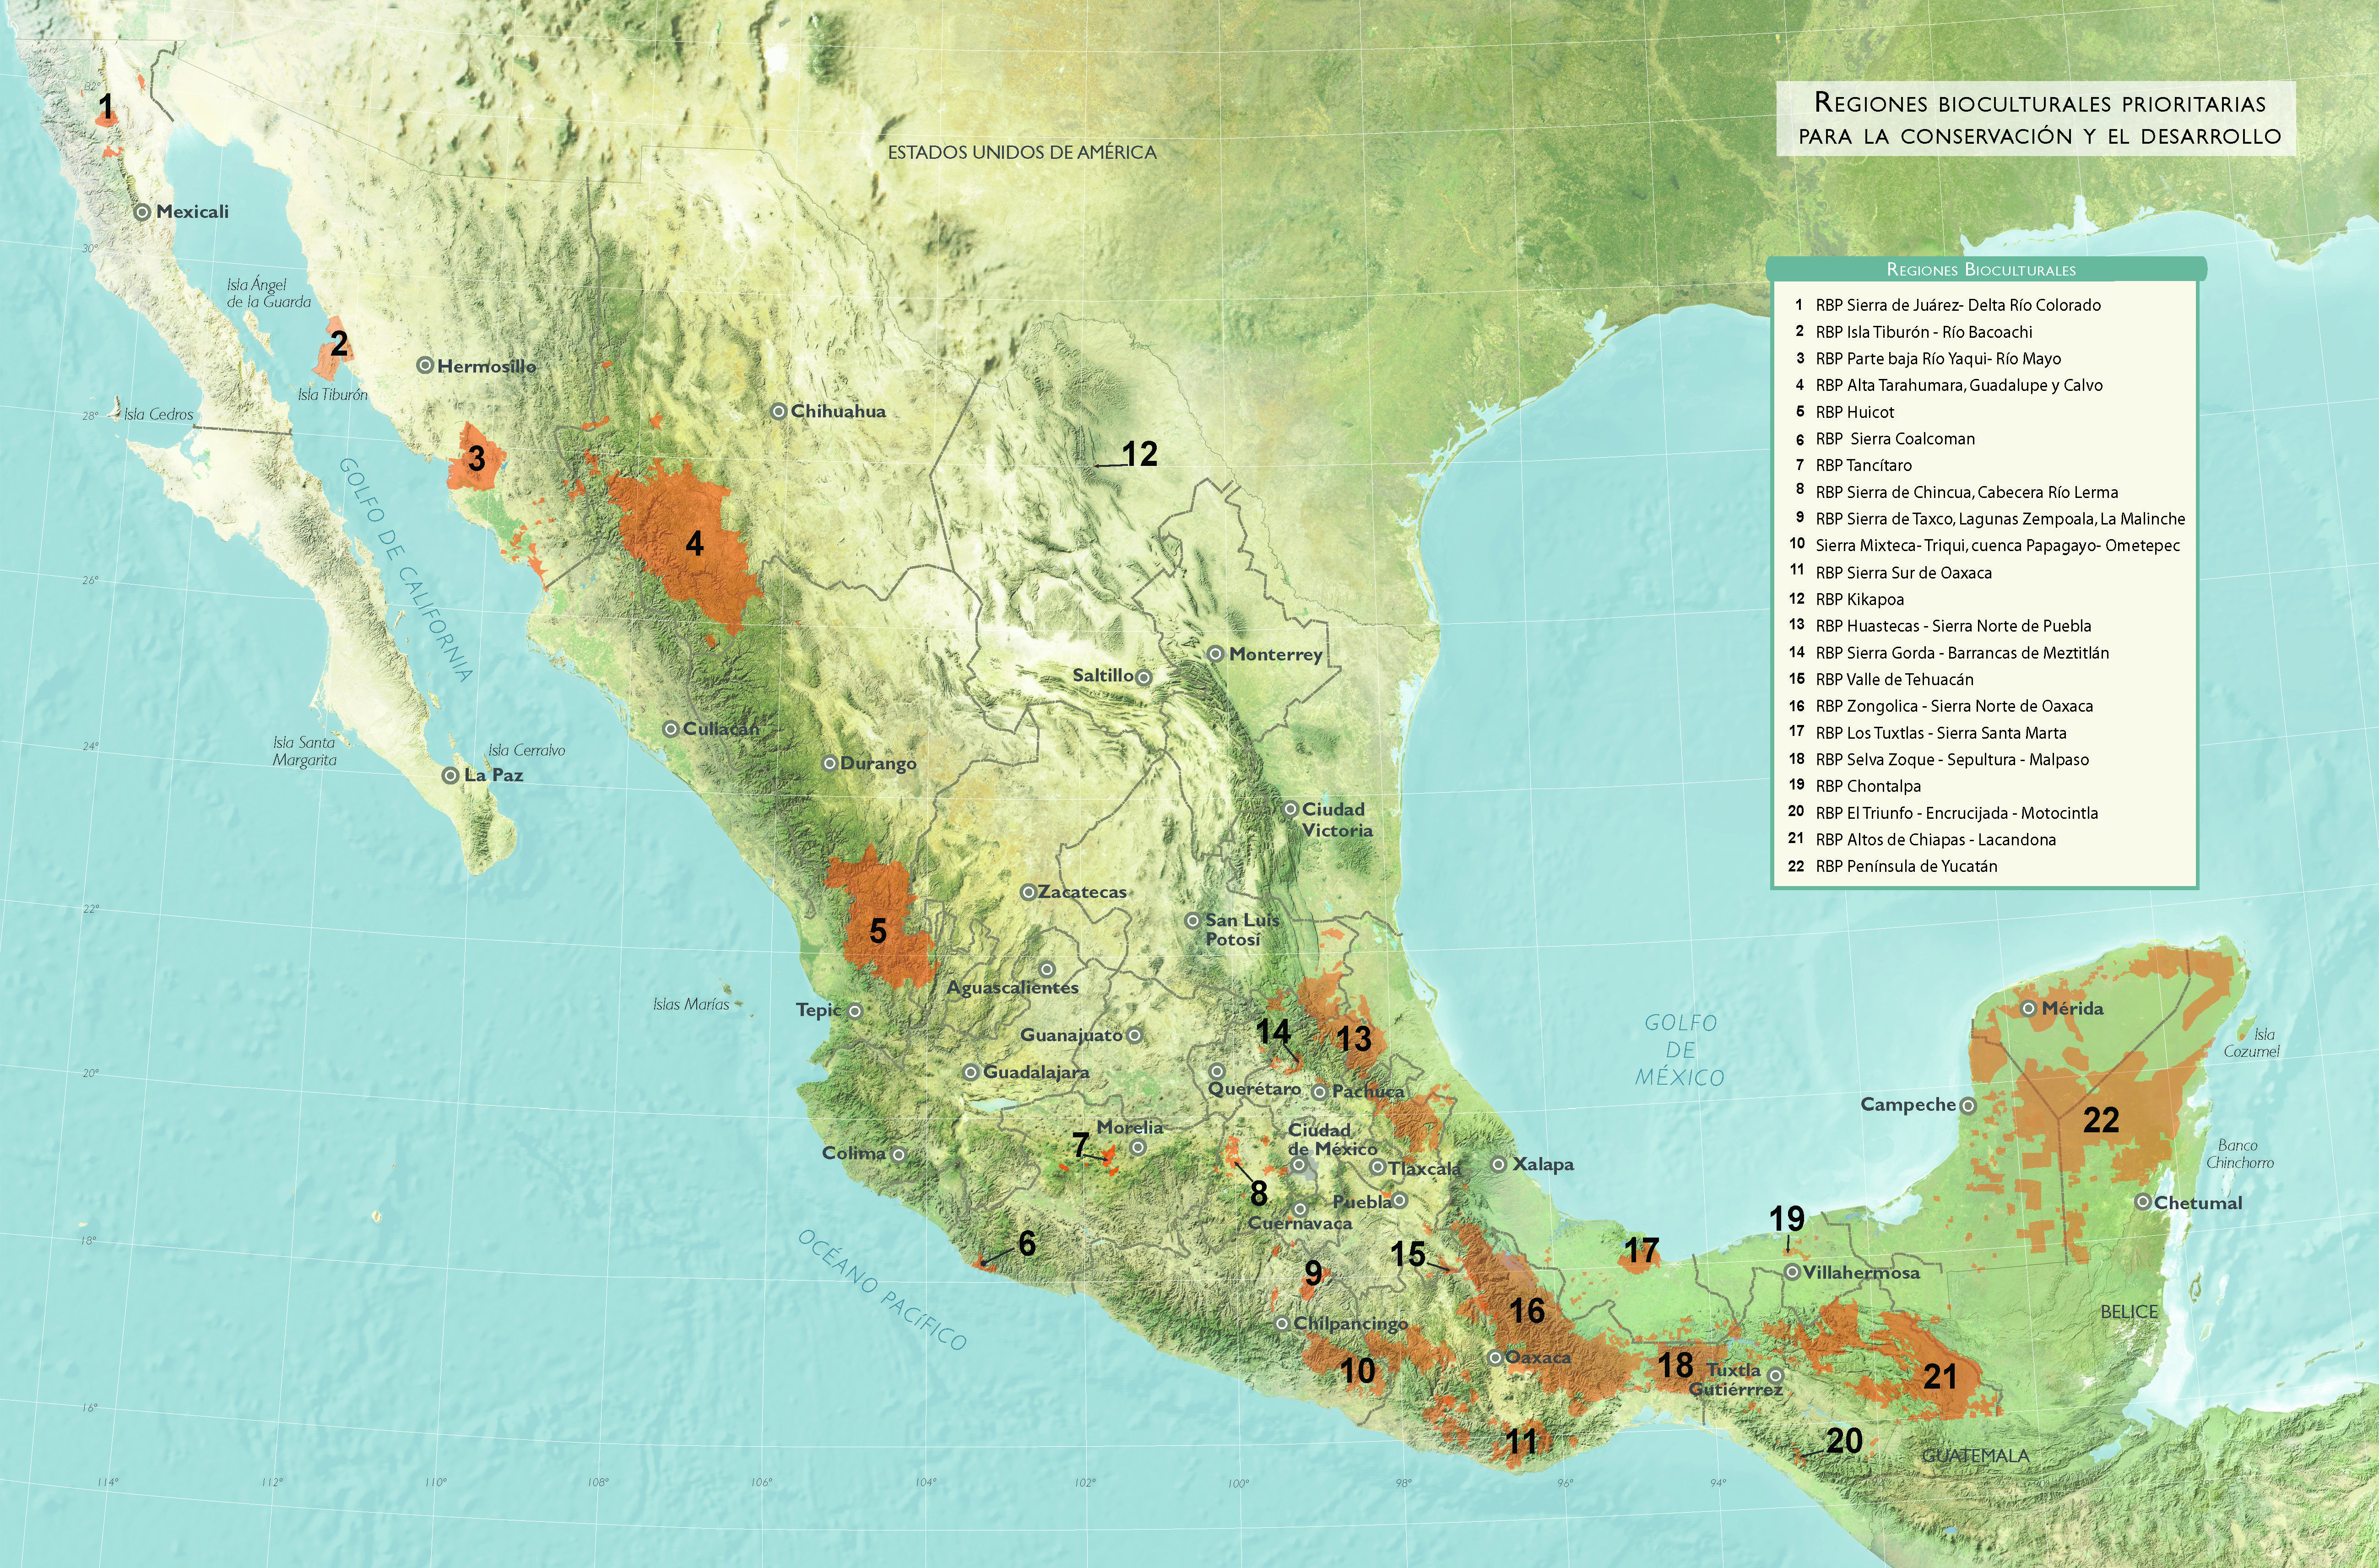 Mexico Coffee Growing Regions Pinterest Coffee - Mexico regions map